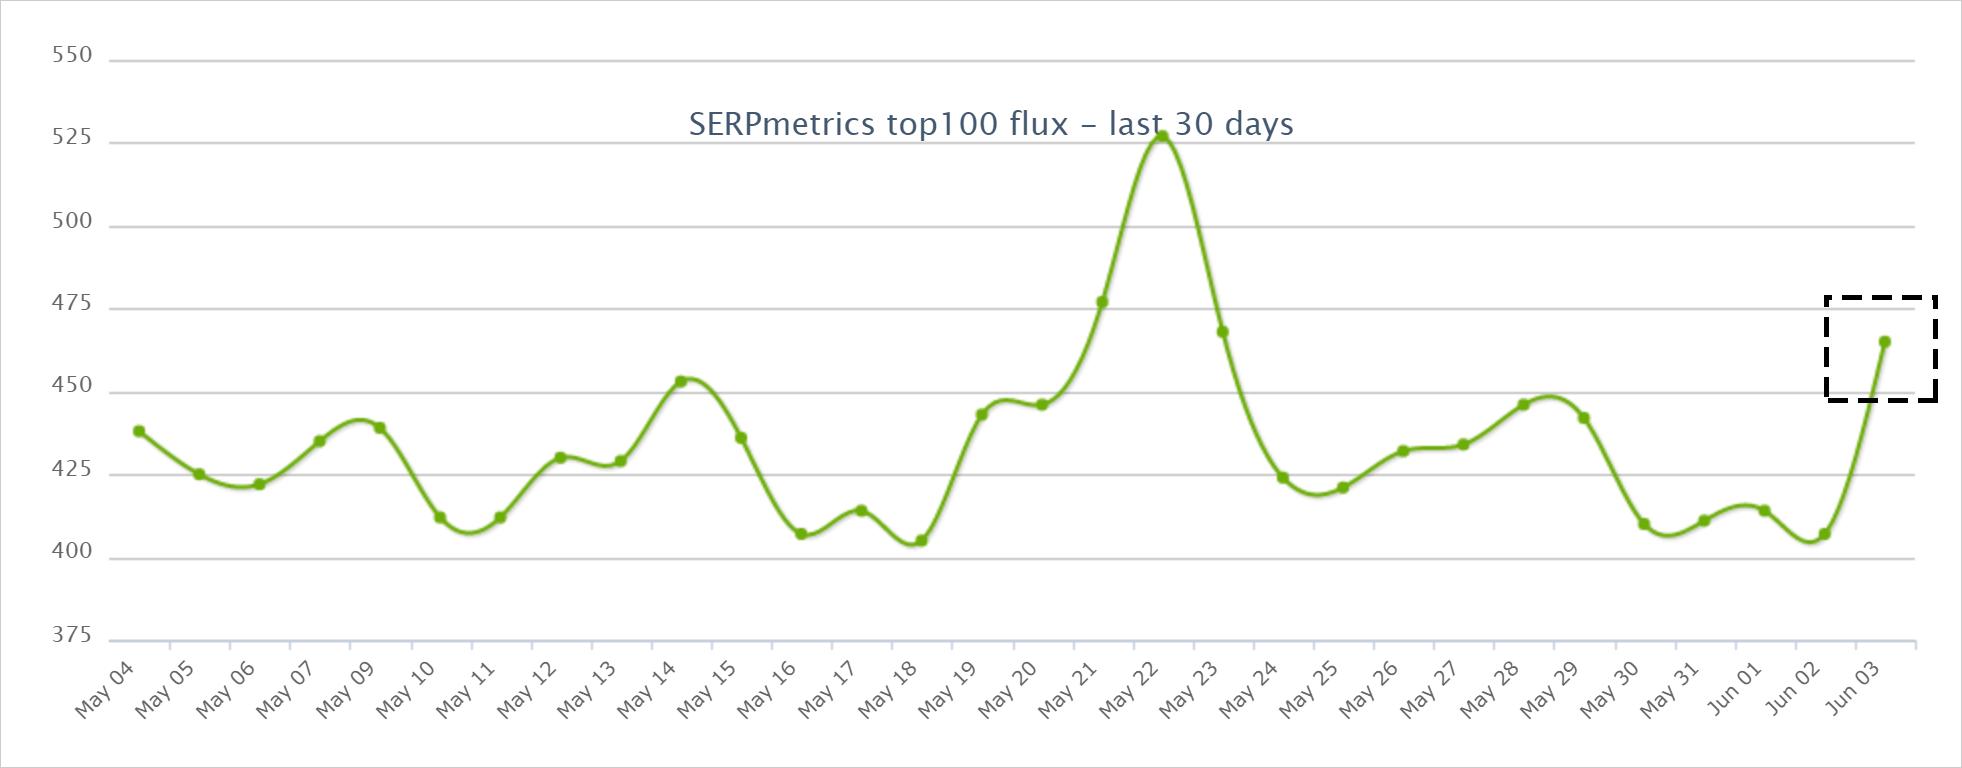 SERPmetricsの2021年6月3日からのコアアップデートによる順位変動